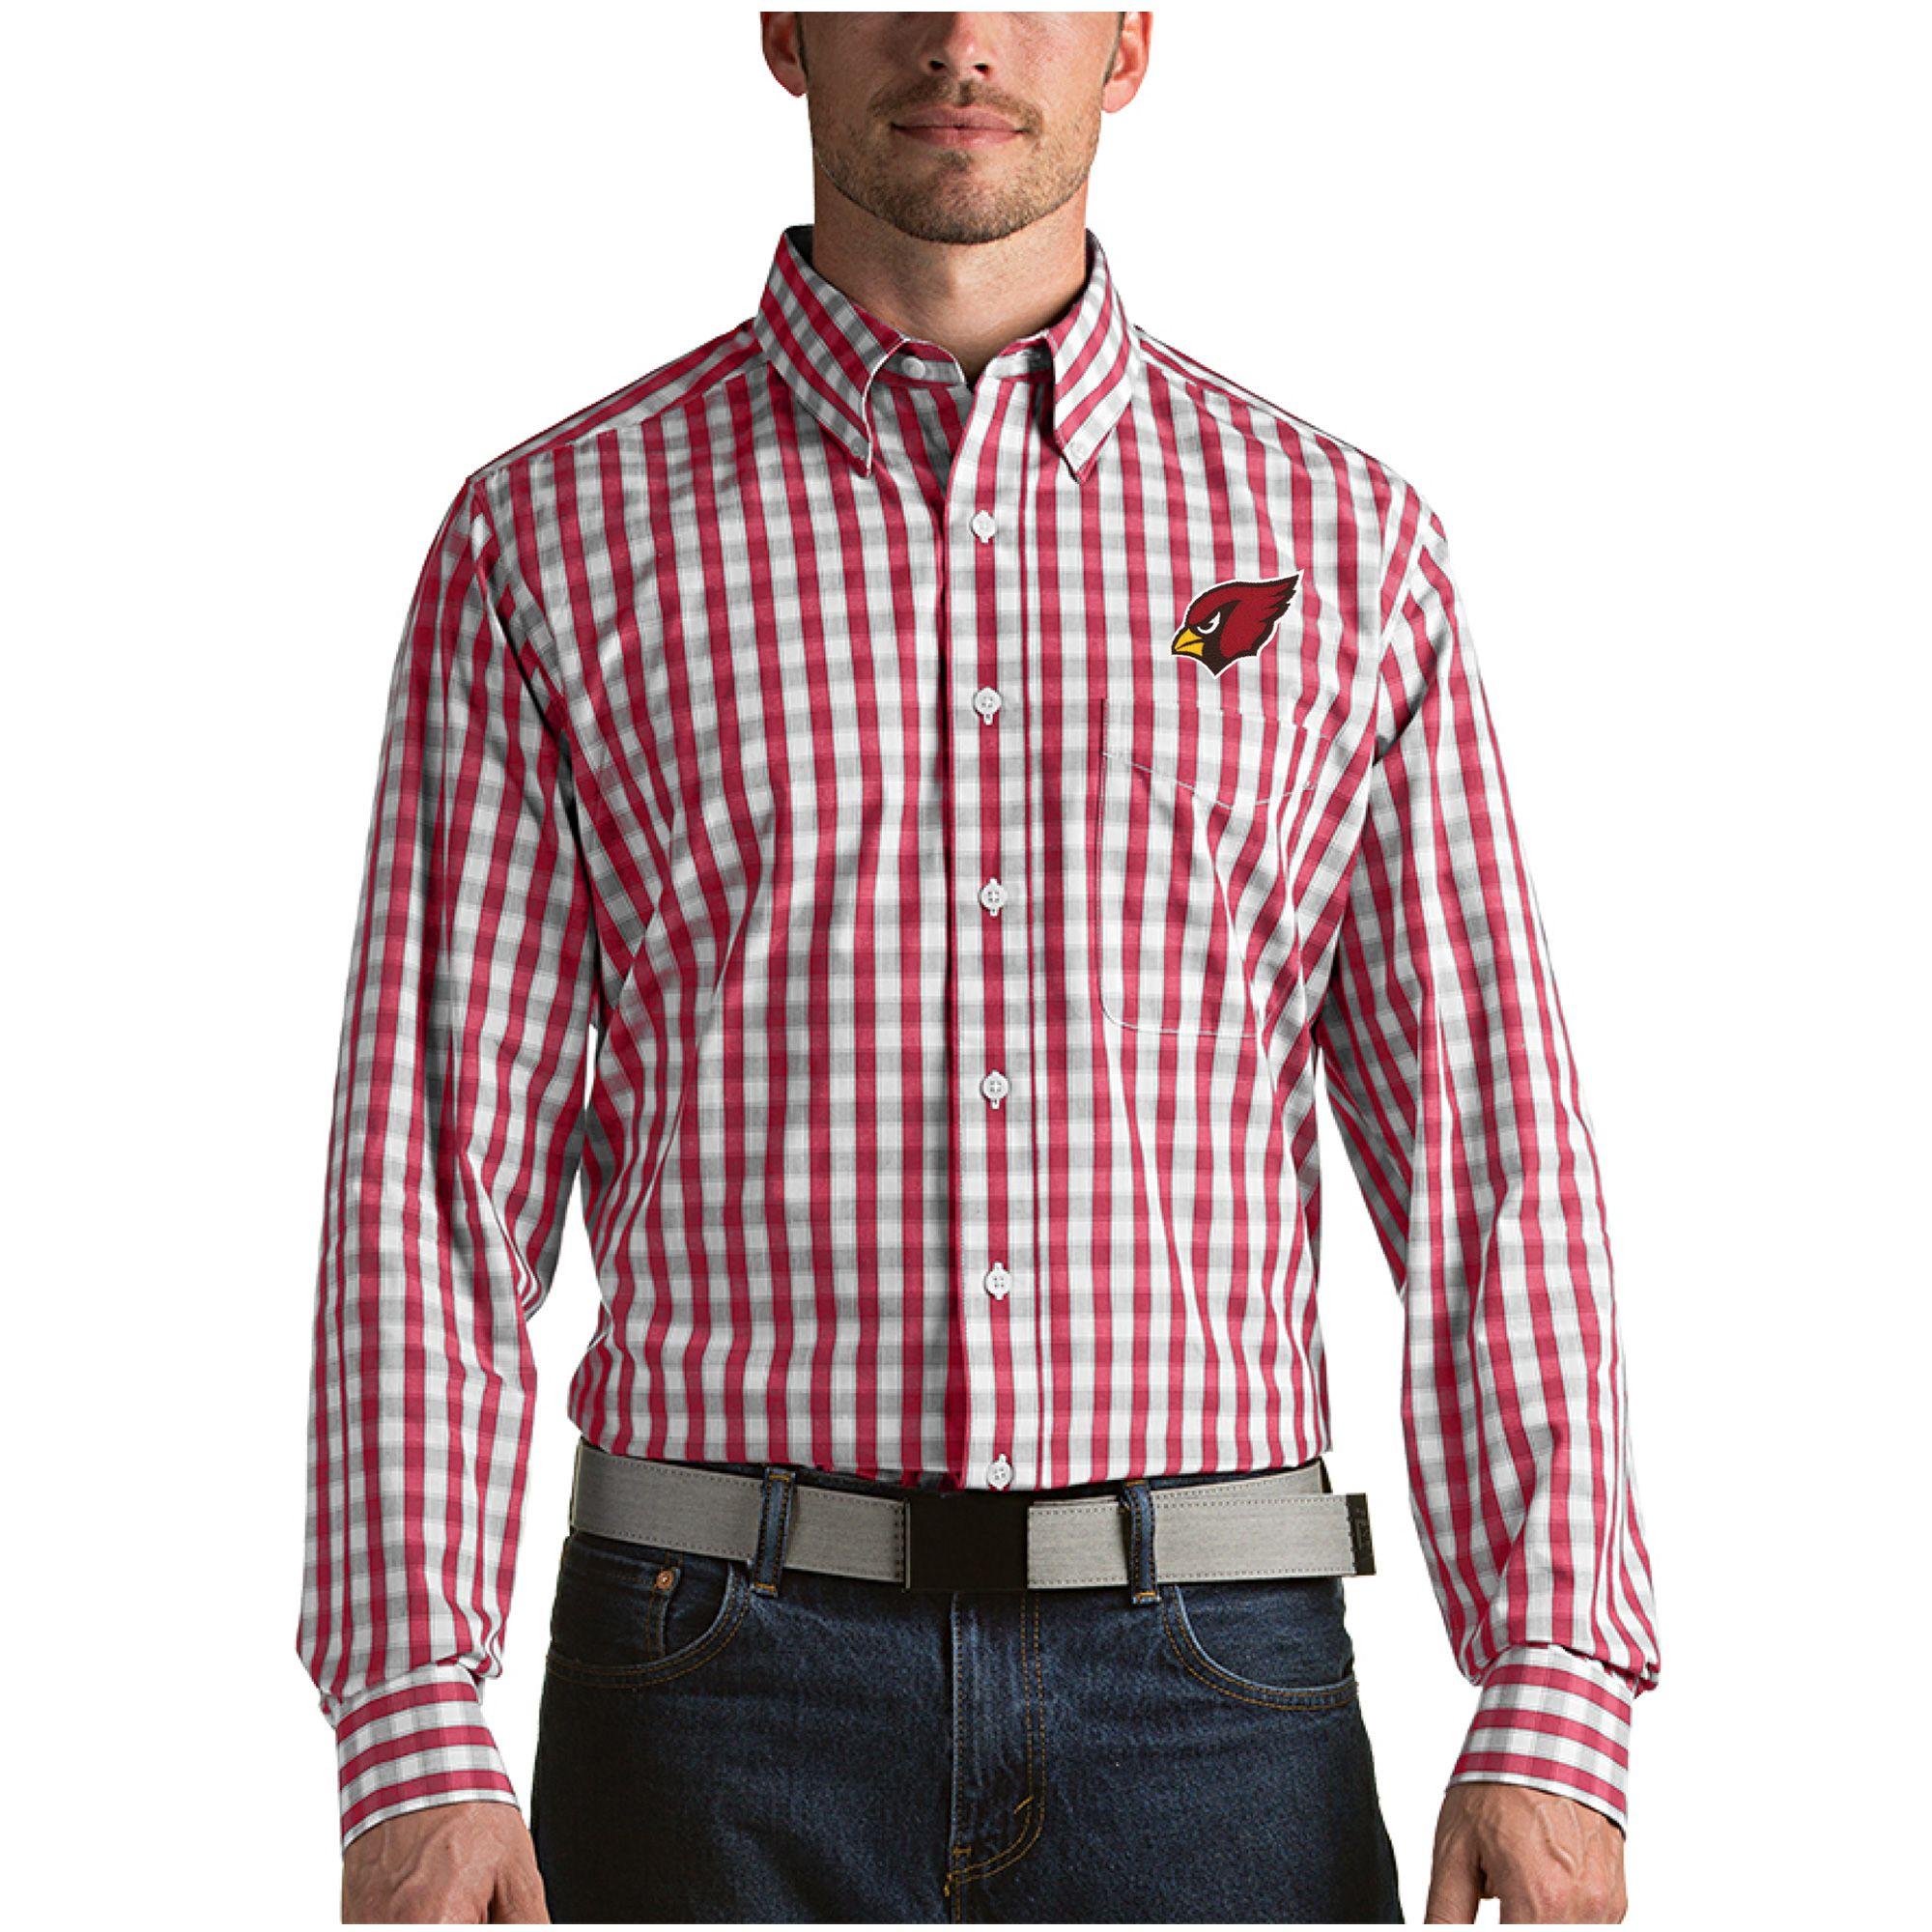 29+ Arizona cardinals dress shirt ideas in 2021